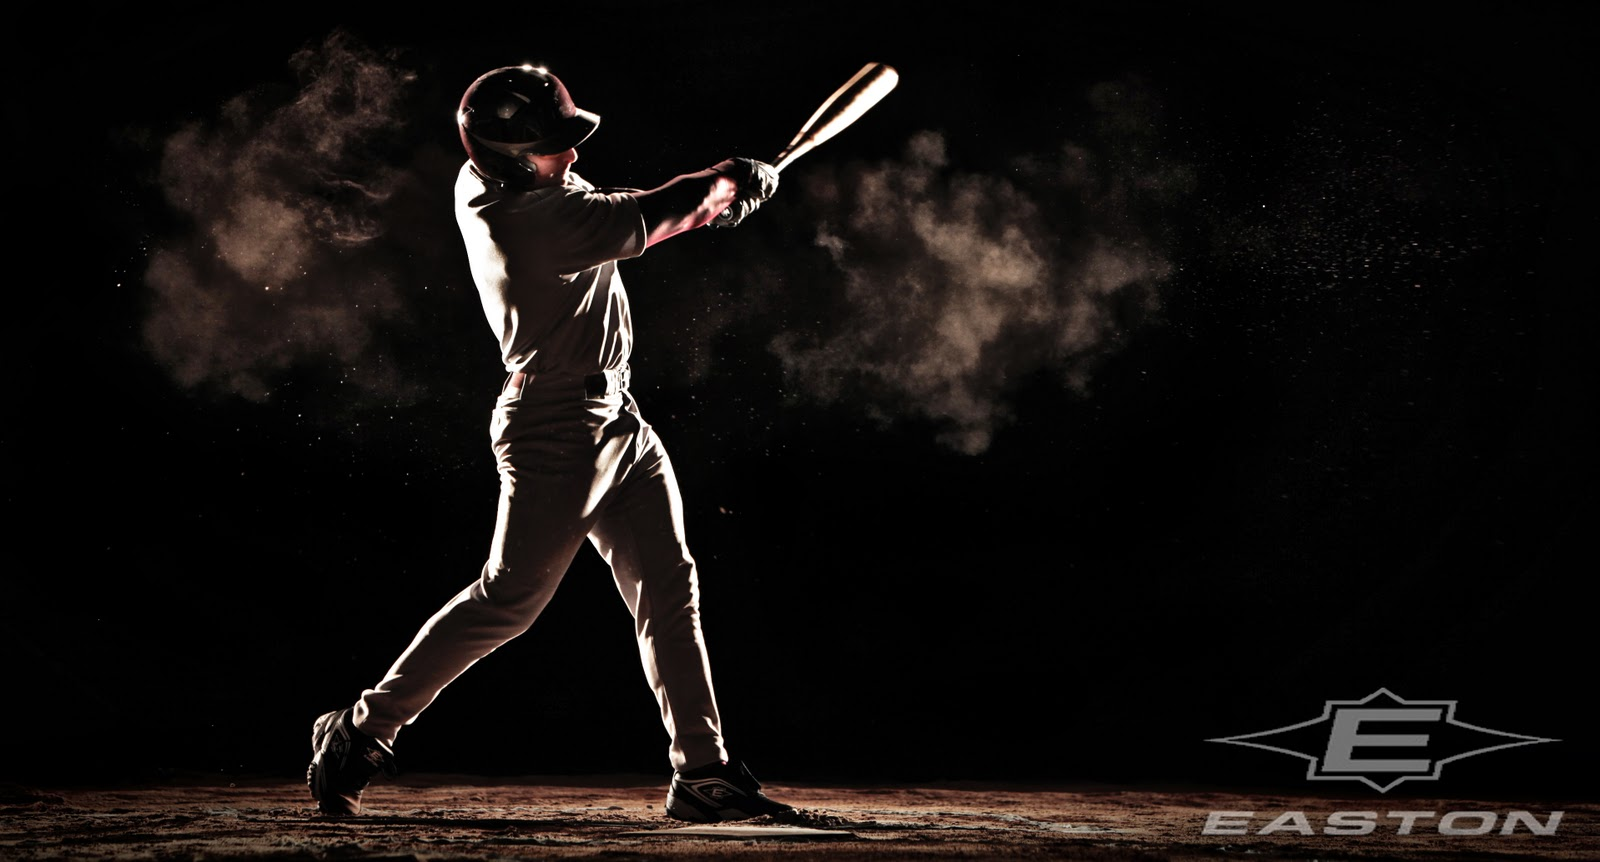 Corra Client, Easton Sports, Praises Magento Enterprise in Feature Video on Magento.com